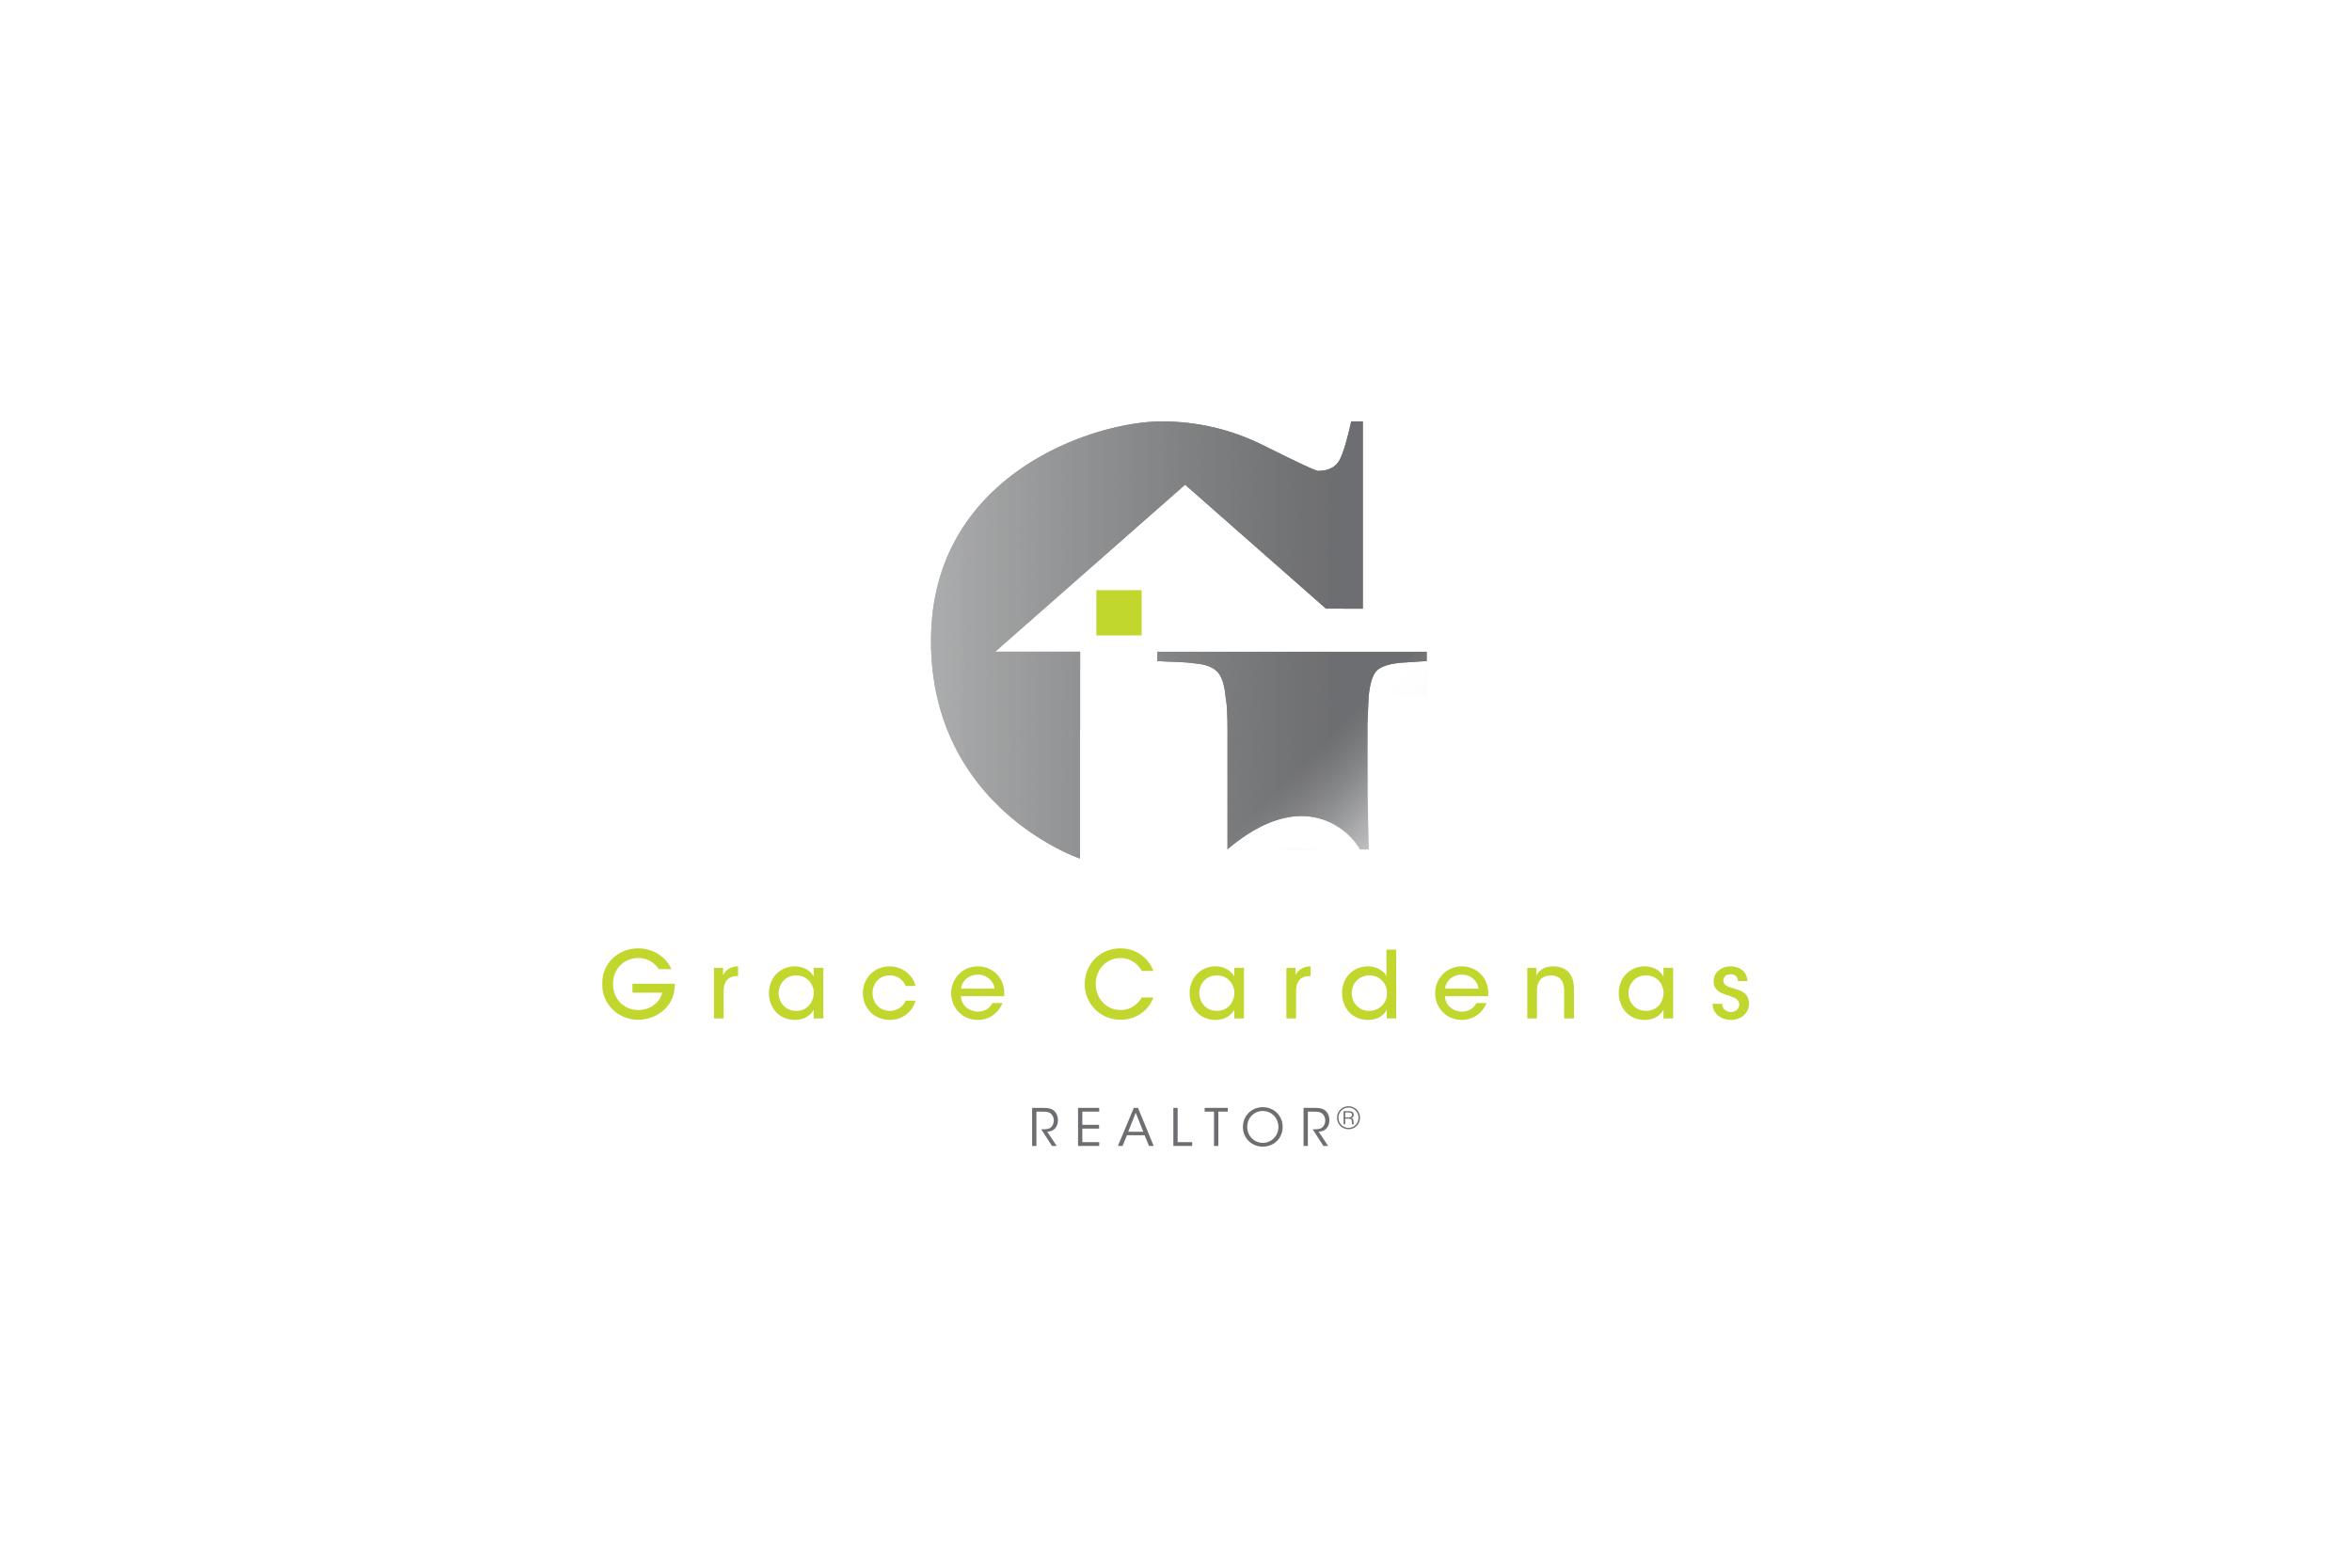 Grace Cardenas REALTOR®